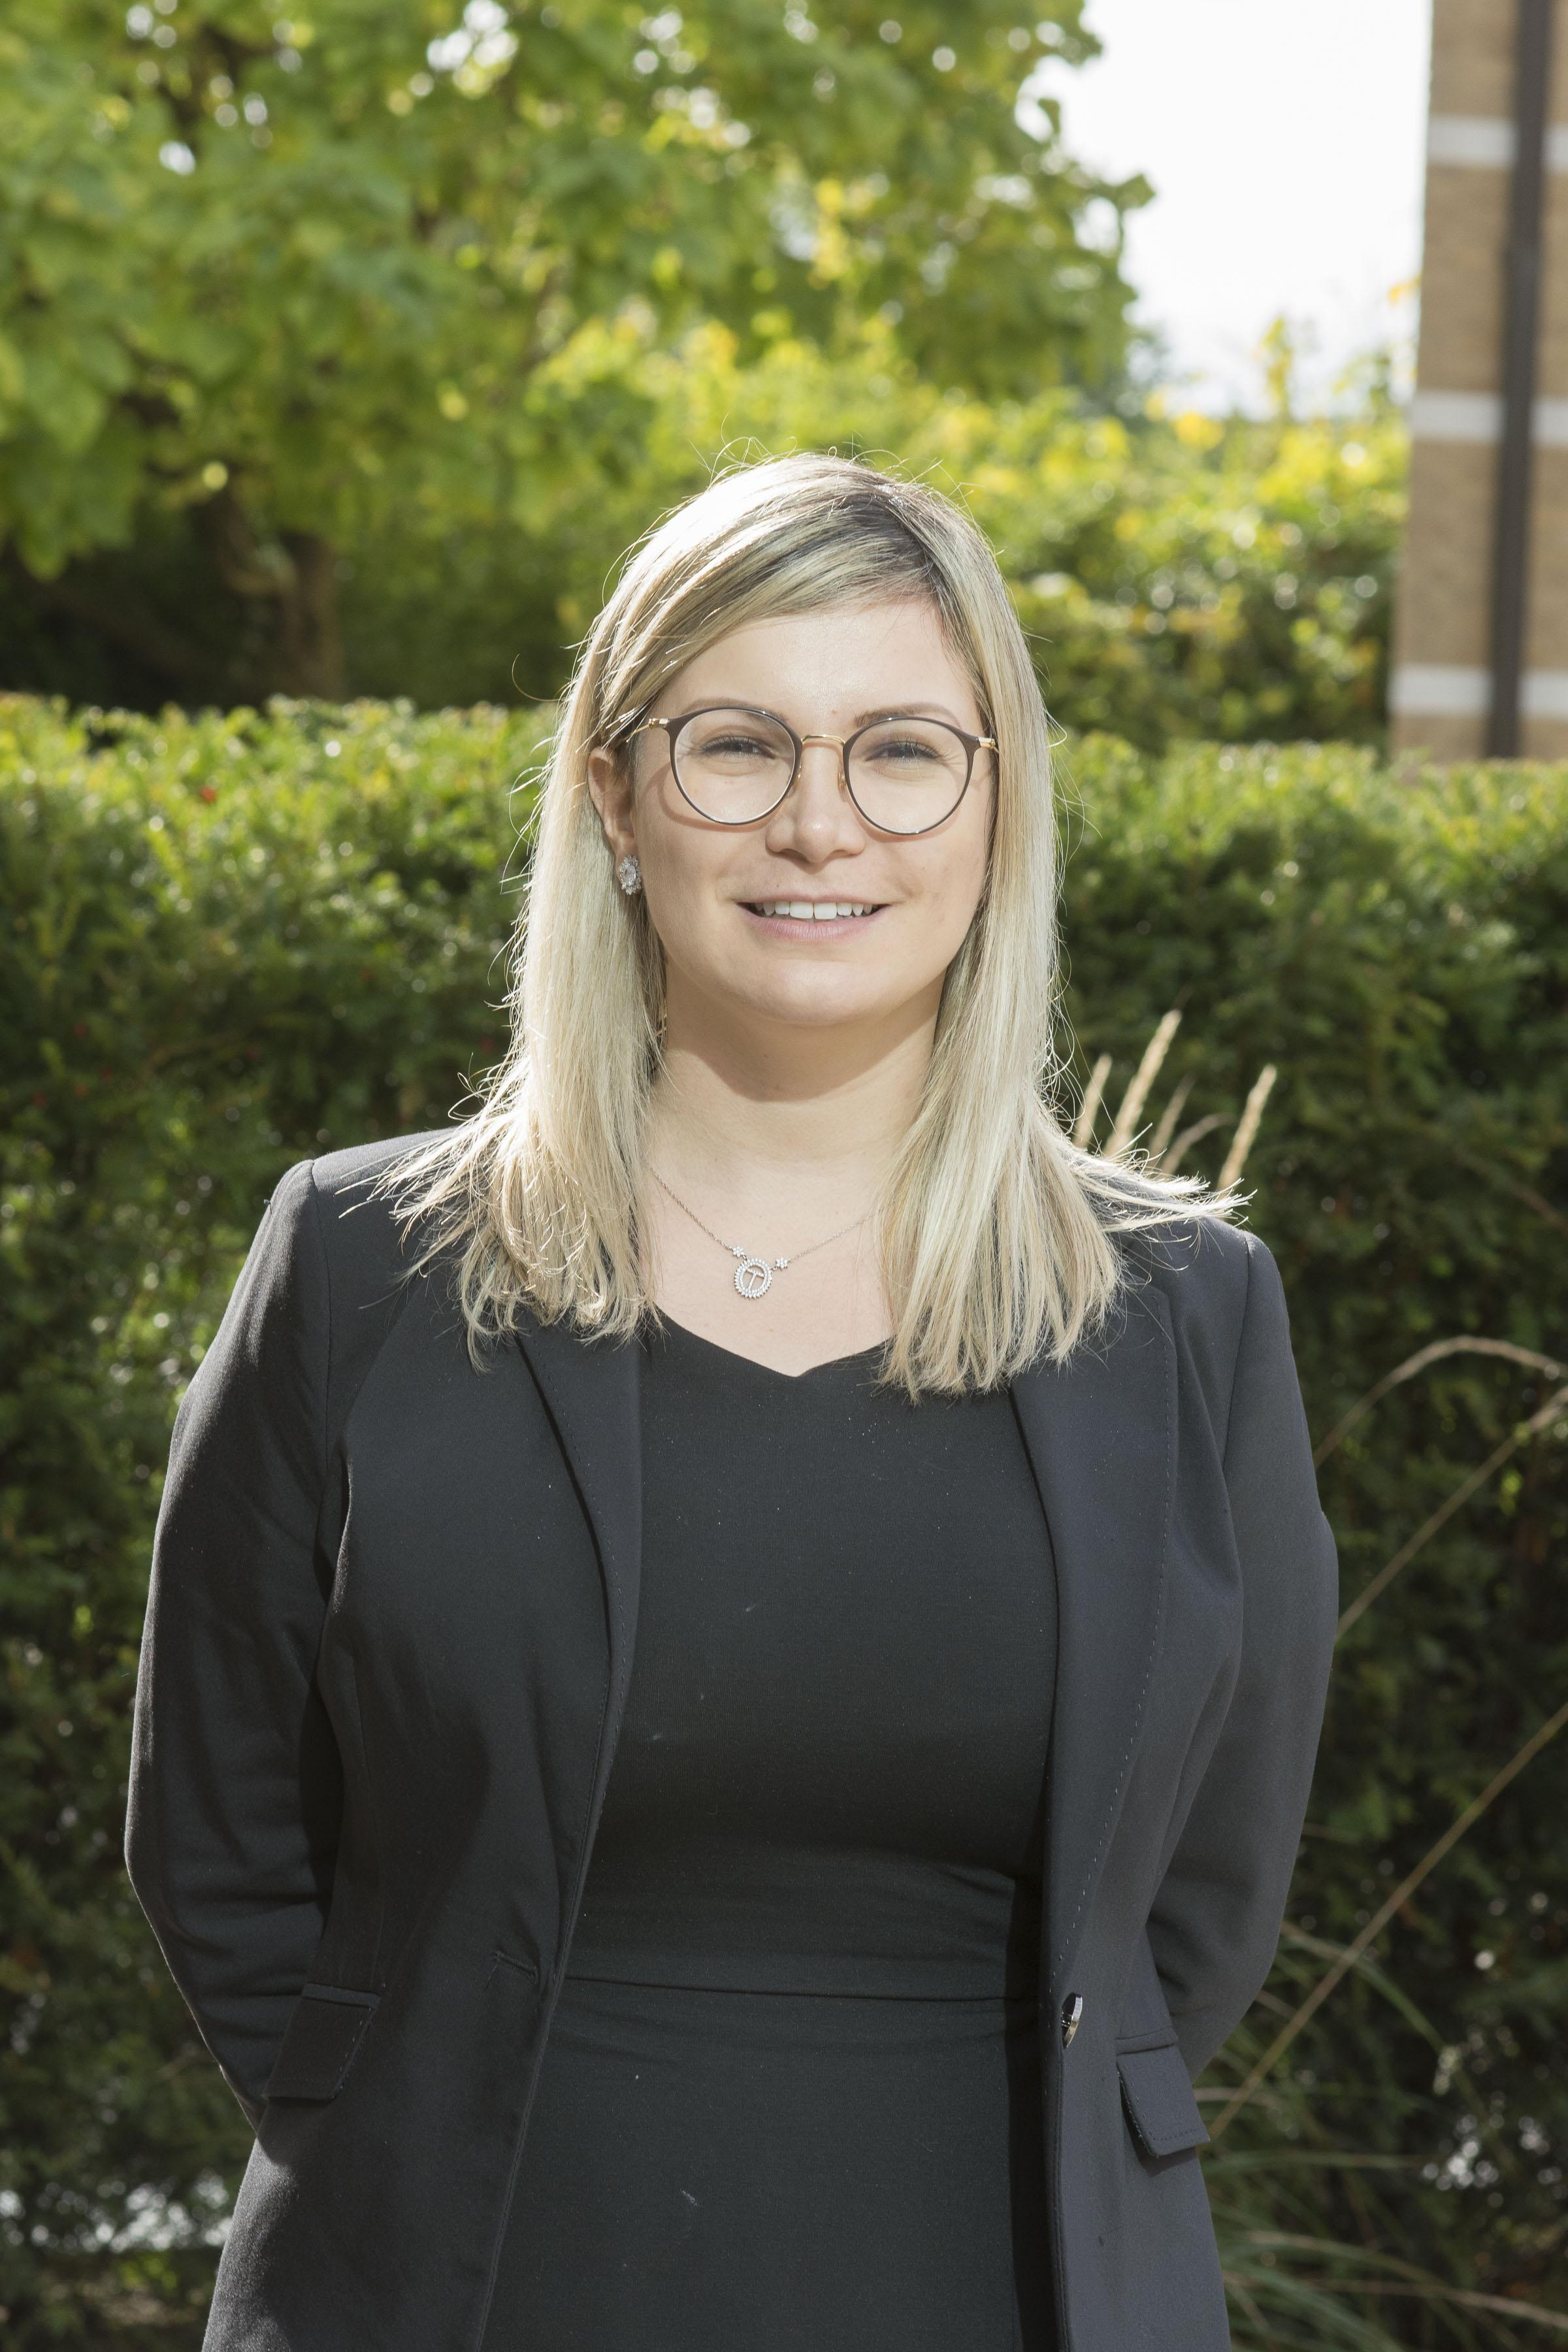 Blog: Thayla Zomer discusses the University of Cambridge BIM Journey